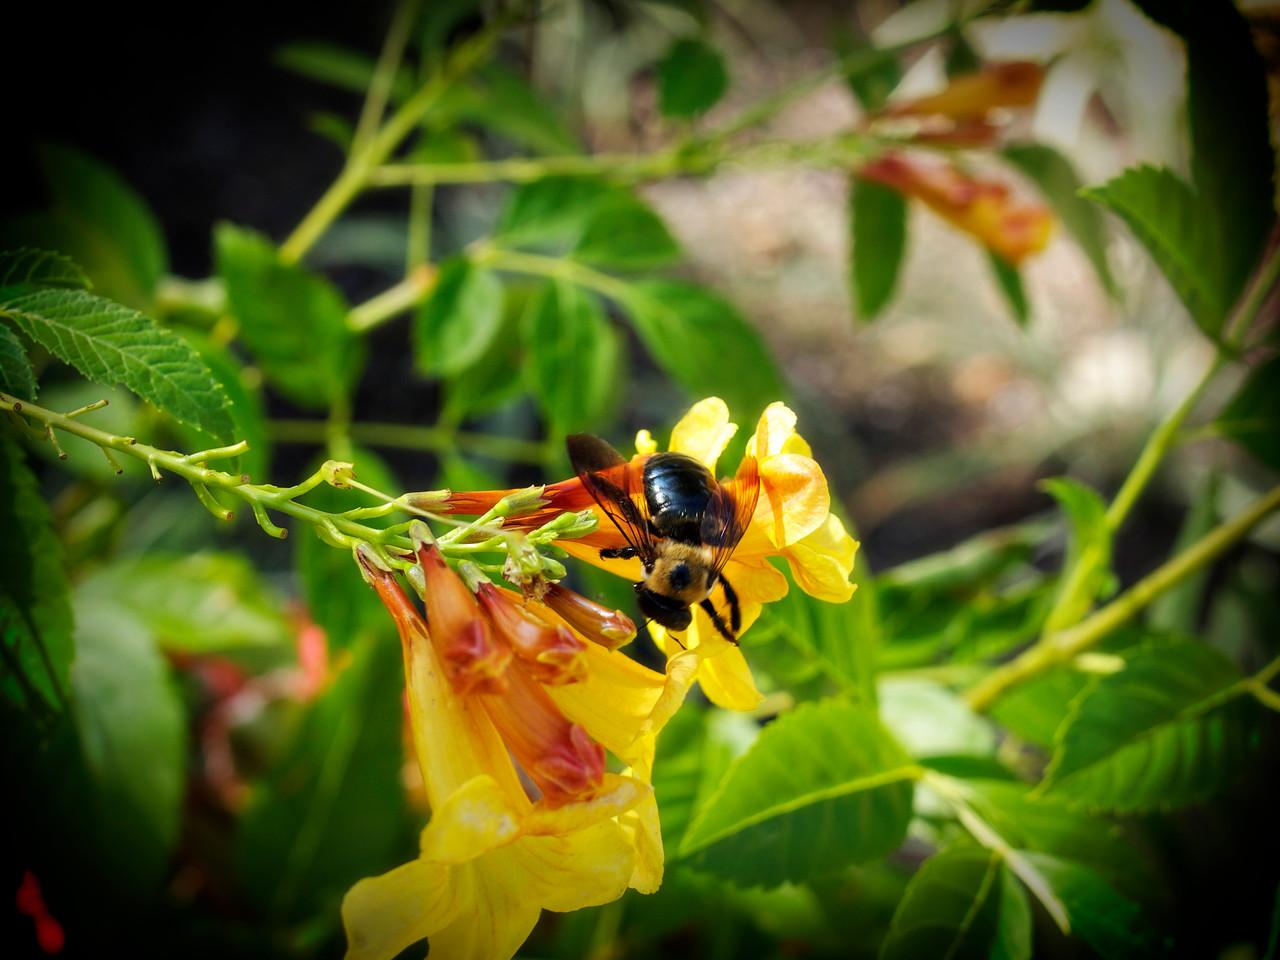 Bumble Bee on Carolina Jessamine - Macro  Order Code: A28